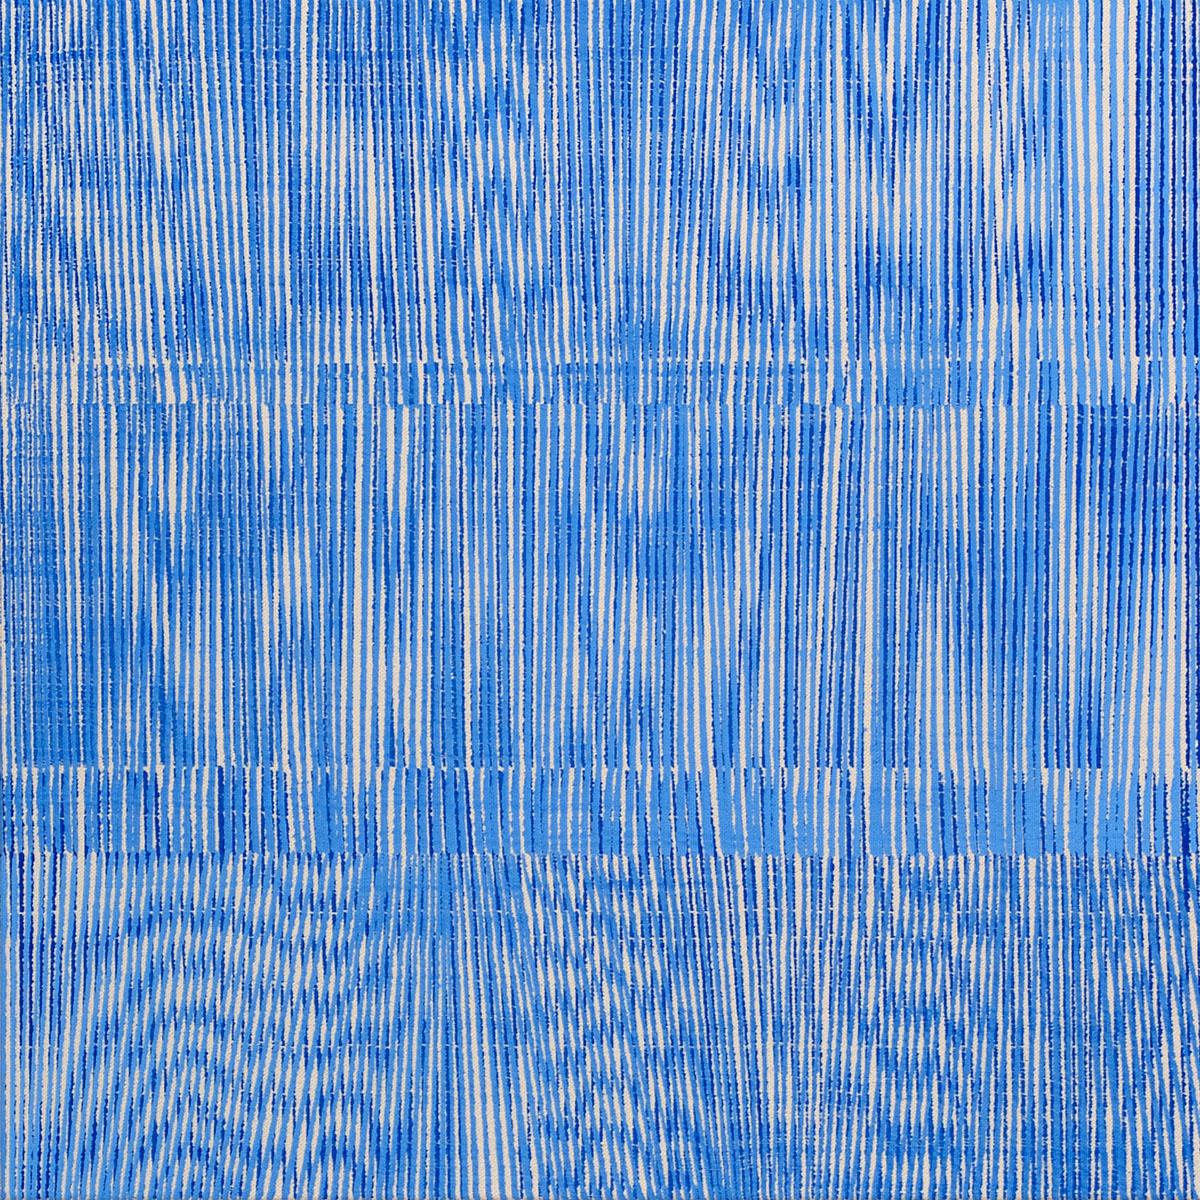 Nikola Dimitrov, FarbRaumBlau VI 2014, Pigmente, Bindemittel auf Leinwand, 50 ×50 cm